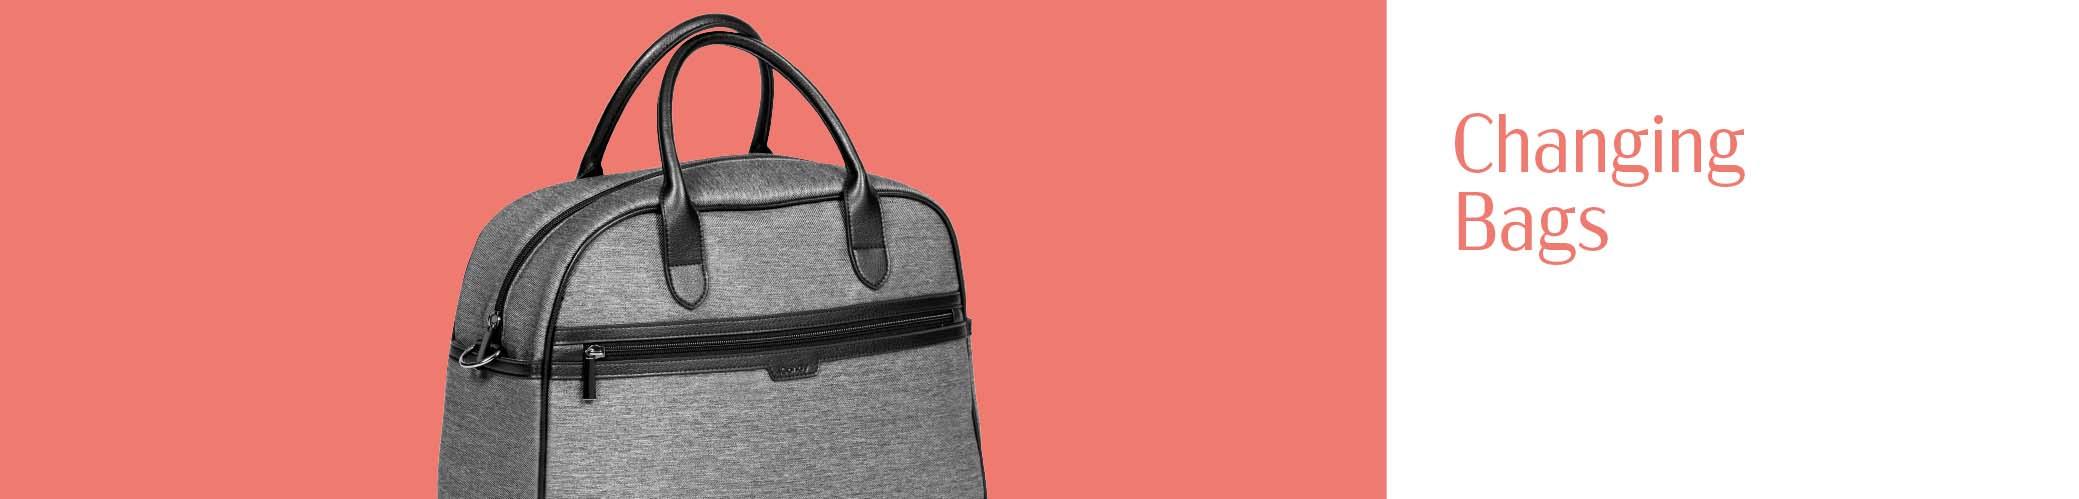 -30-changingbags-internalbanner-may21.jpg